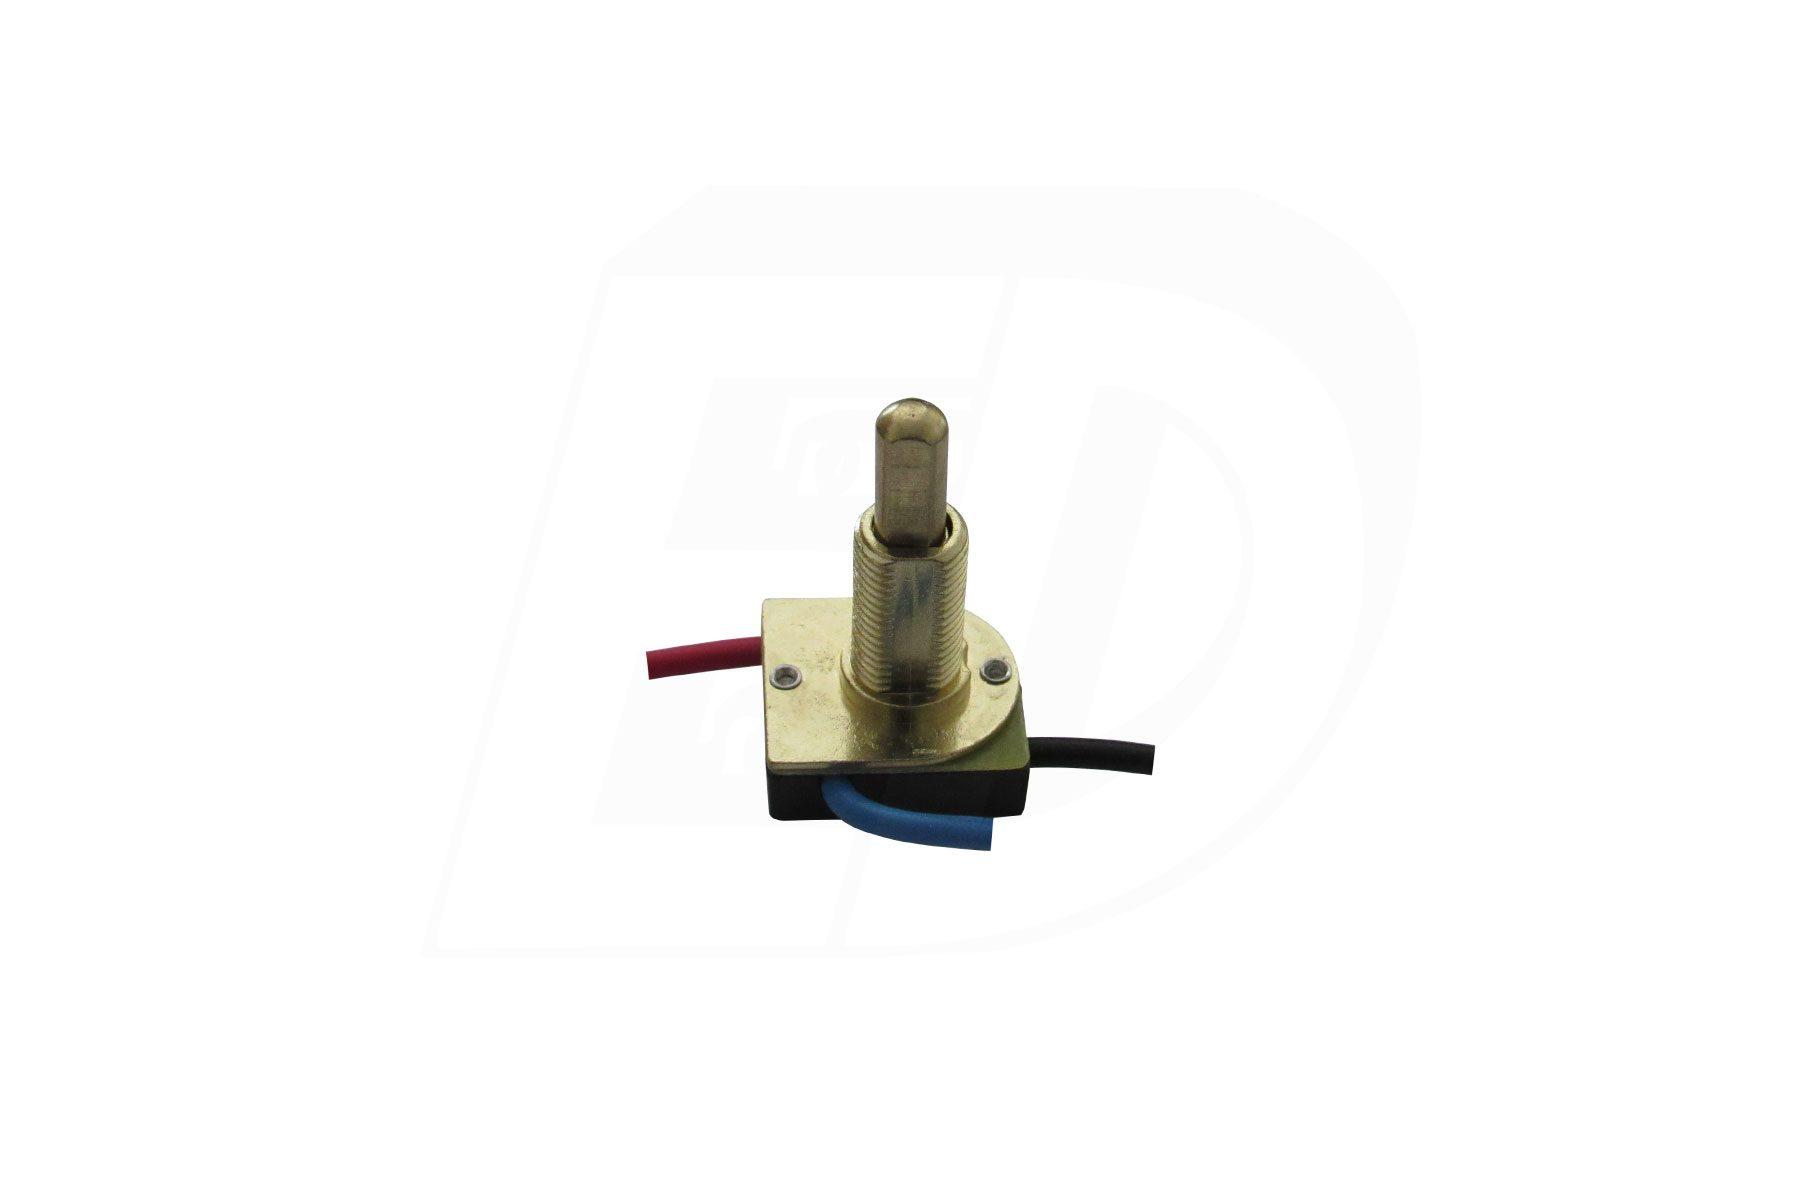 SPST Push Button Lamp Switch